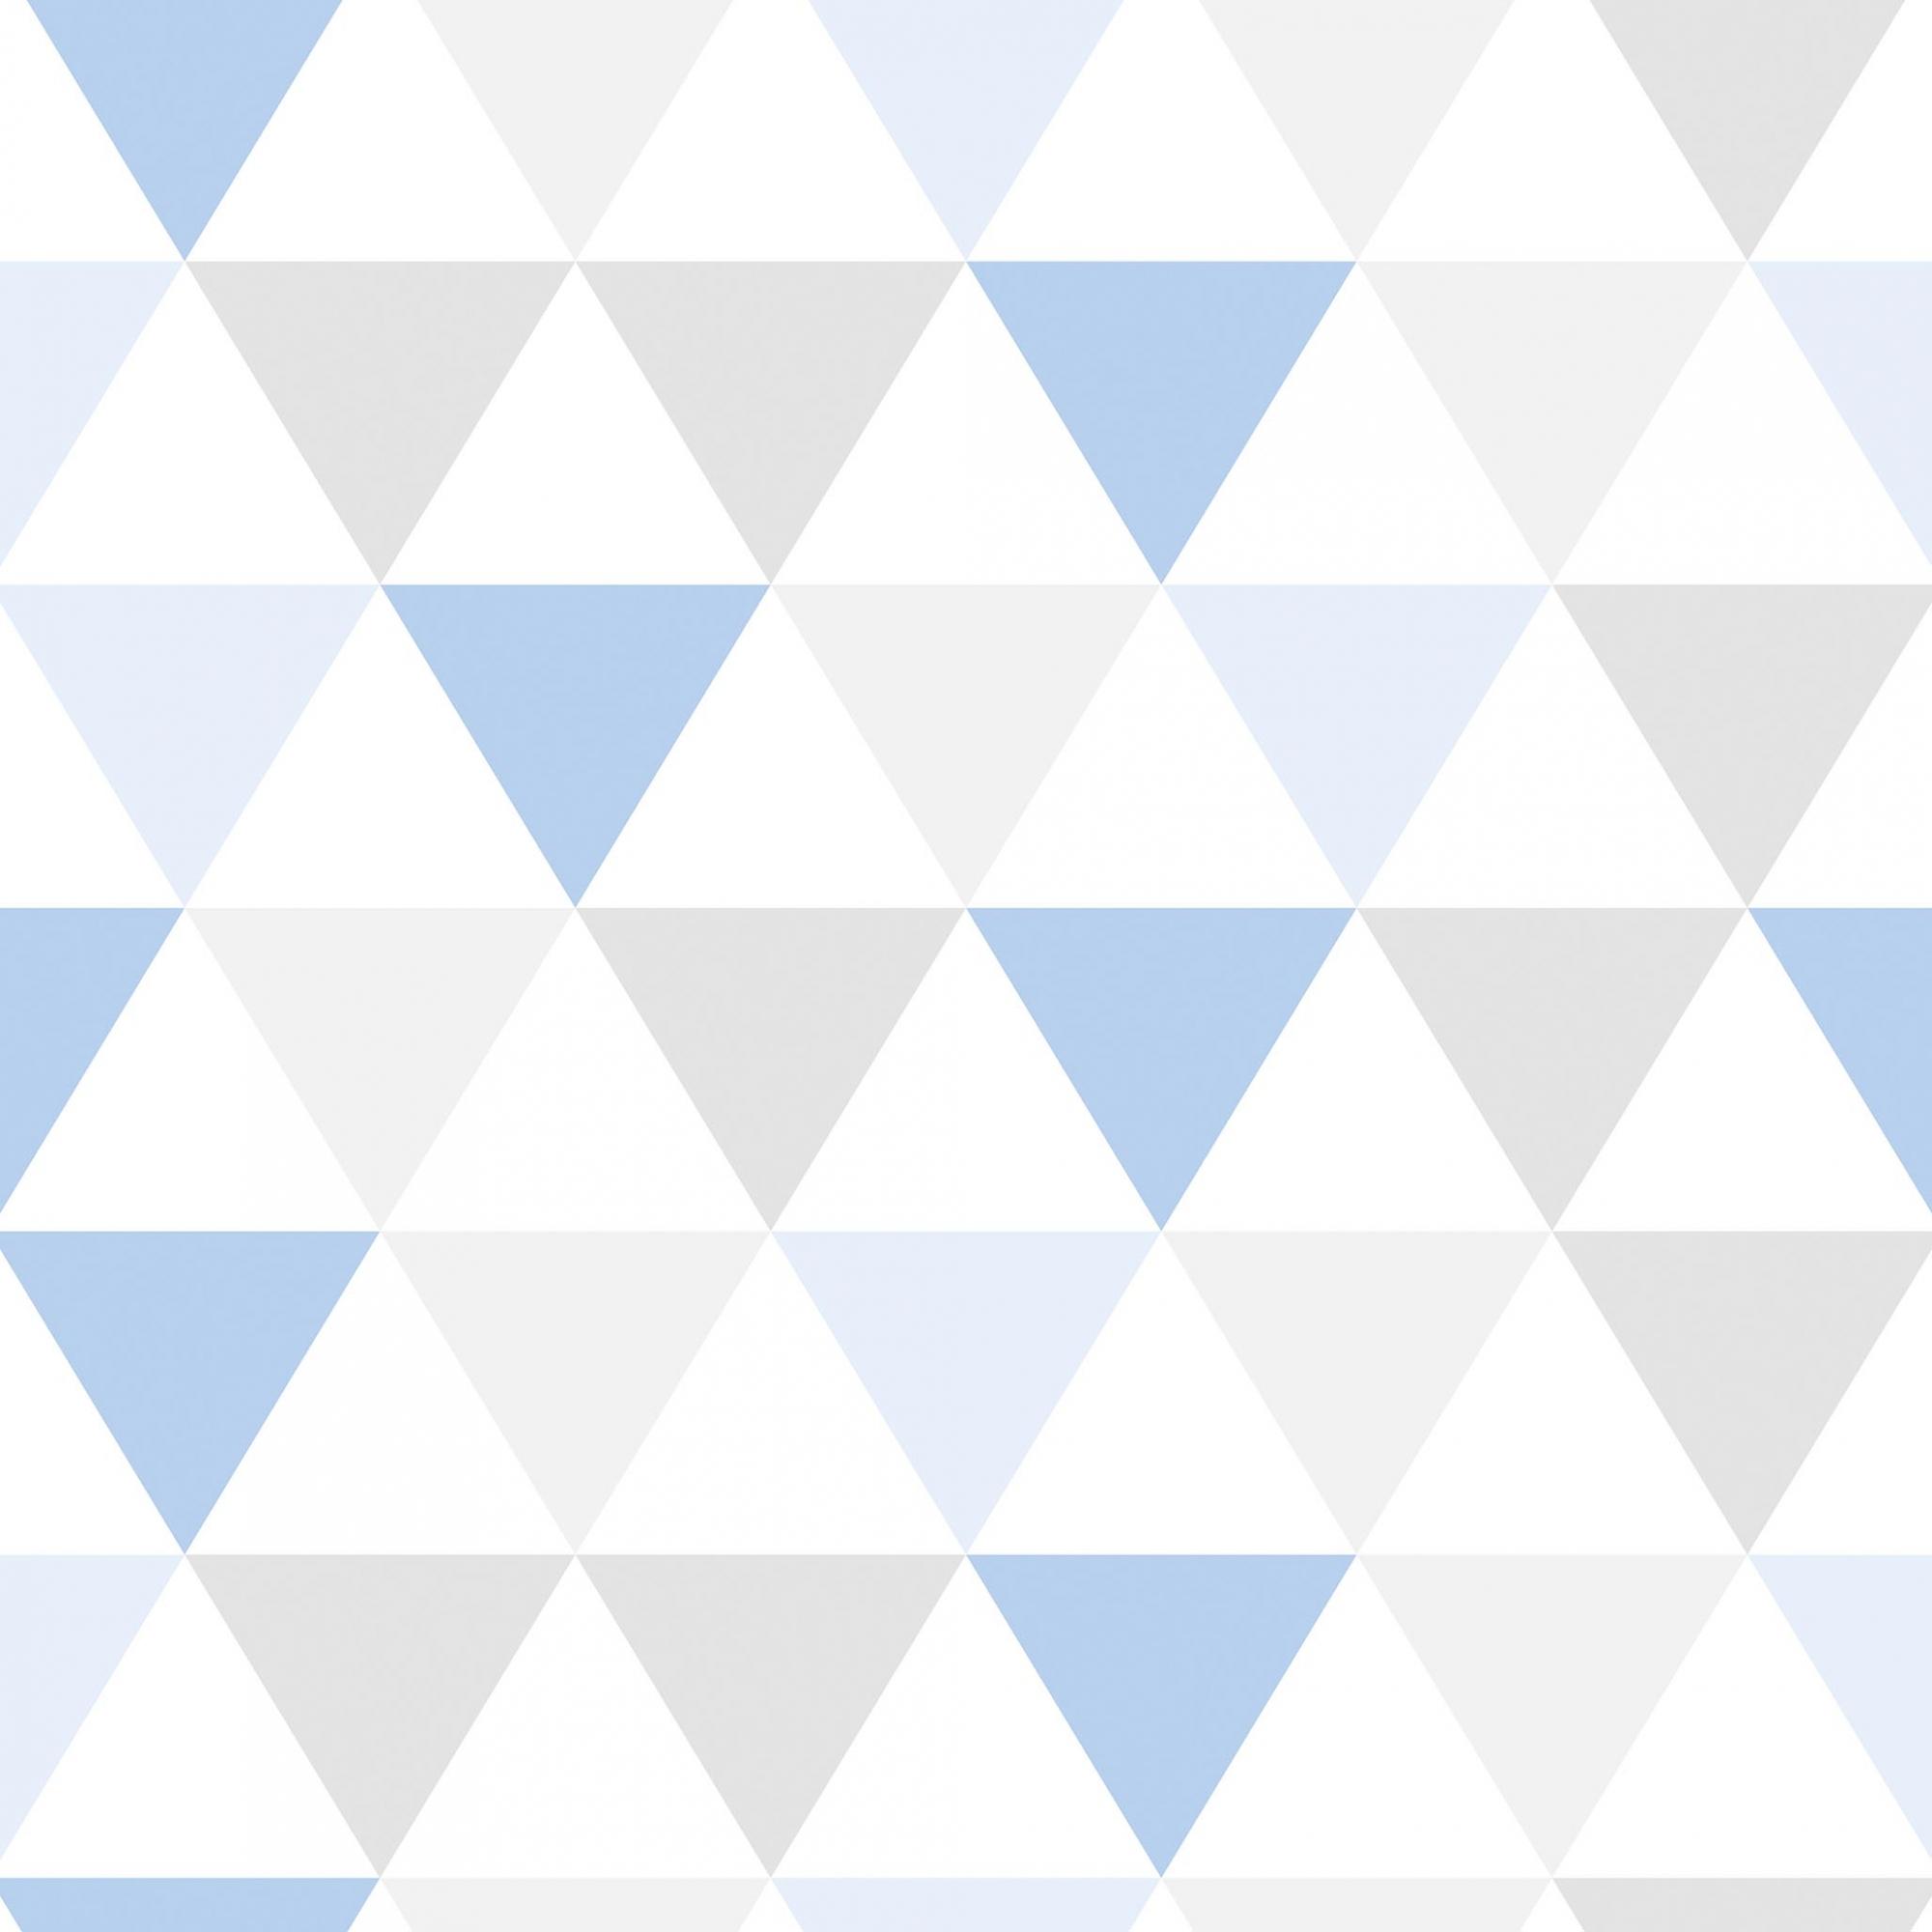 Papel de Parede Geométrico Triângulo Azul e Cinza Tons Claros